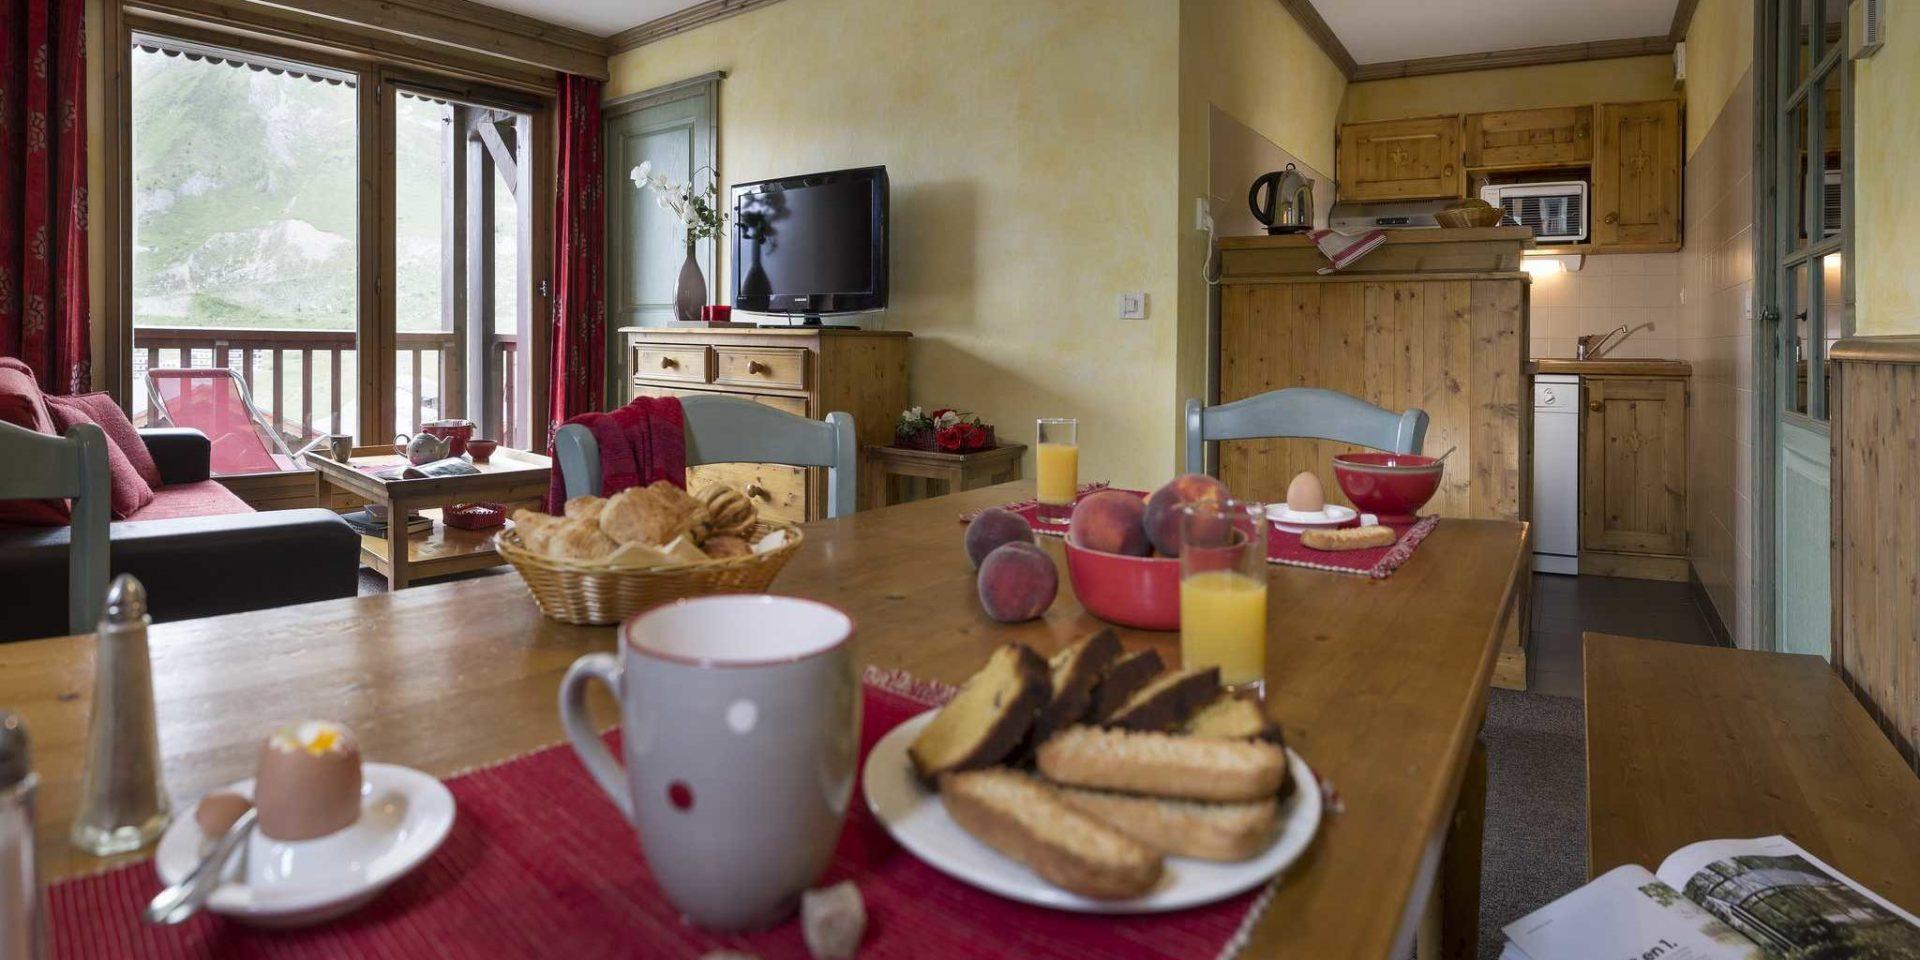 Residences Village Montana Tignes Tignes-Val d'Isere Frankrijk wintersport skivakantie luxe living 3K6 gedekte tafel ontbijt broodjes perziken eieren houten stoelen bankje rode bank salontafel thee TV vaas bloem balkon rode ligstoel keuken